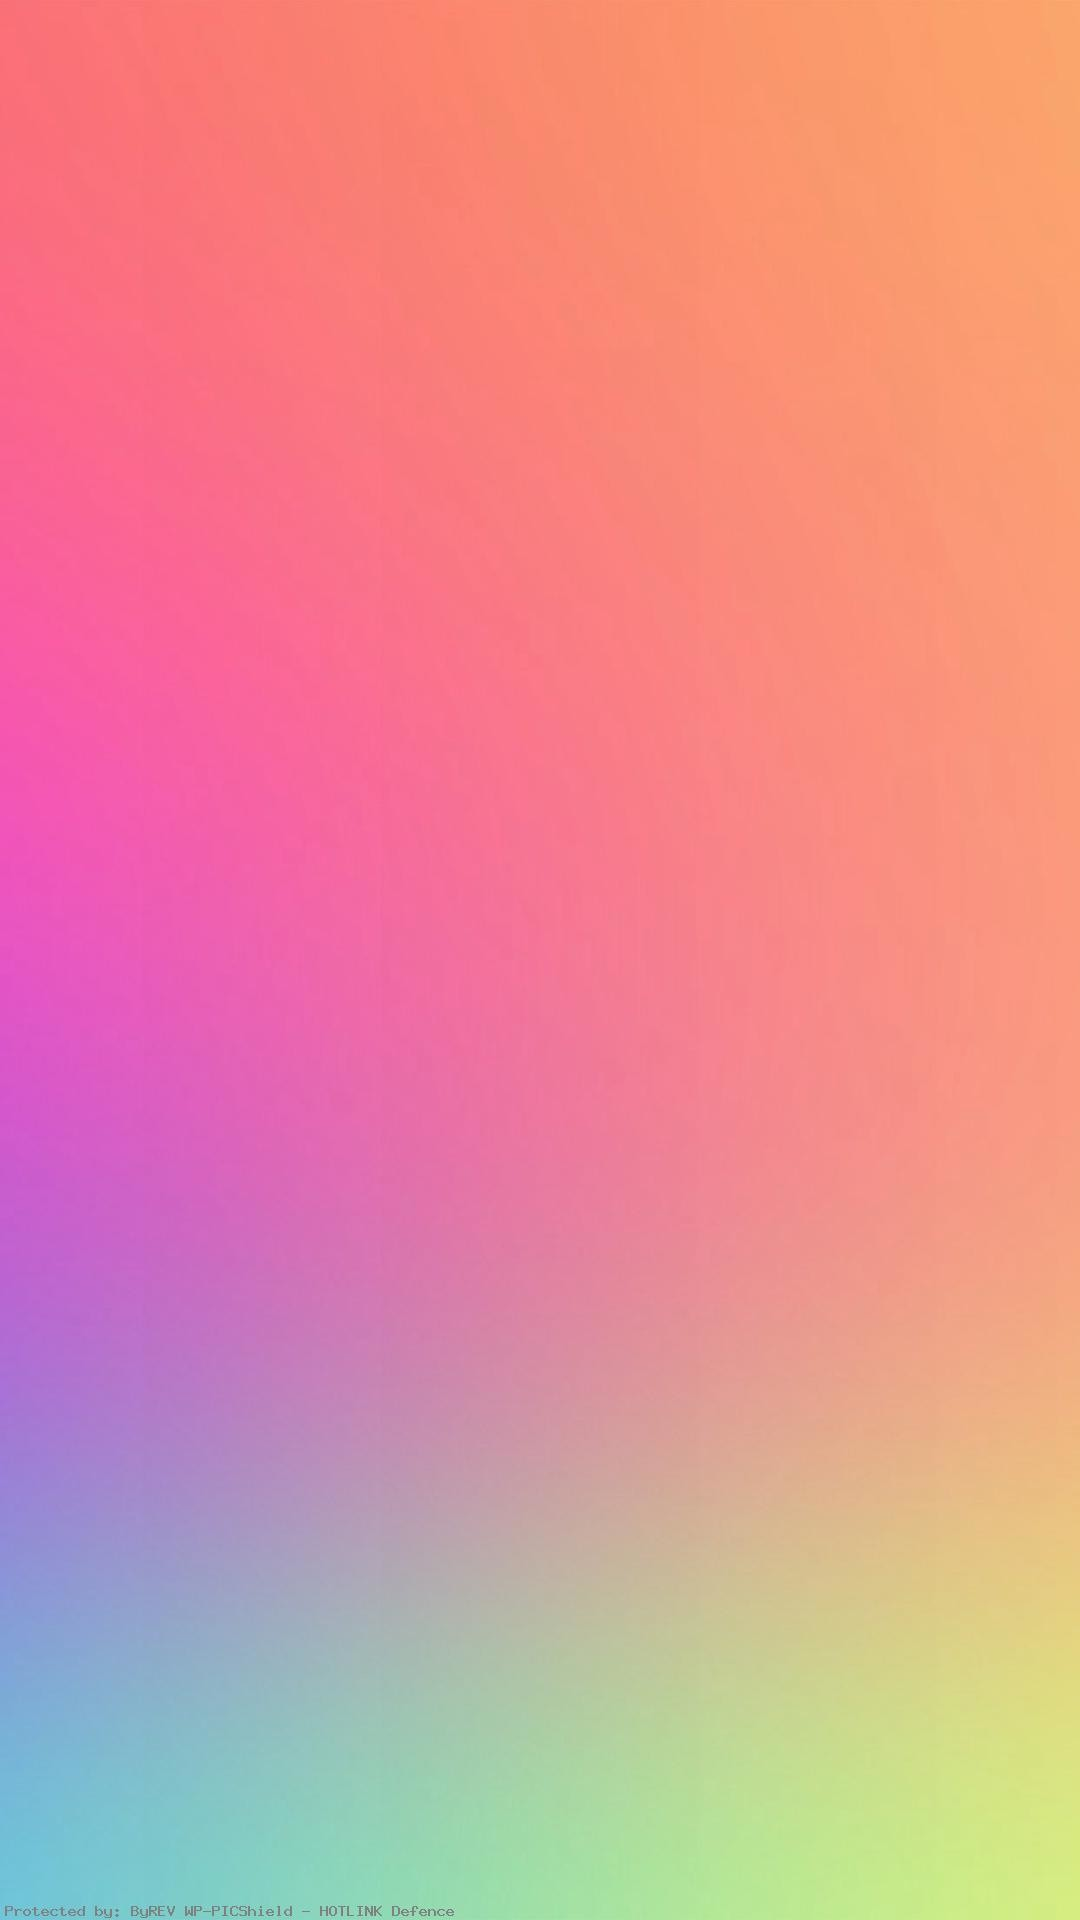 Orange-Sunshine-Gradation-Blur-iPhone-wallpaper-wp60010674